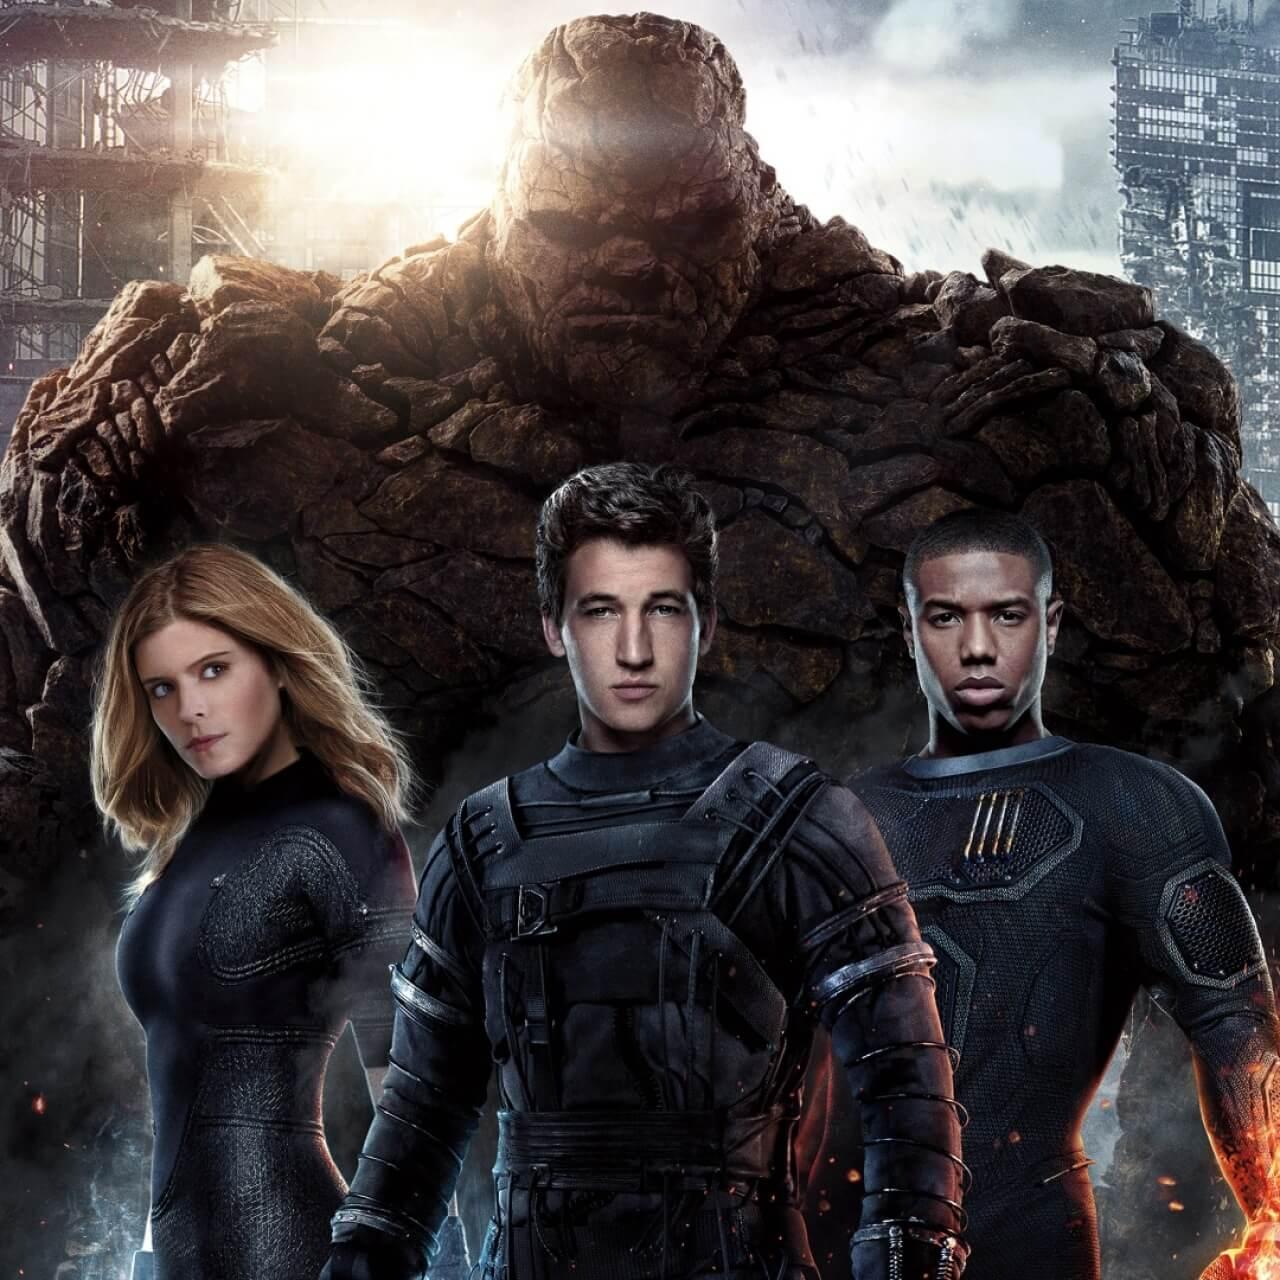 Free Comic Book Day 2015: Fantastic Four (2015)